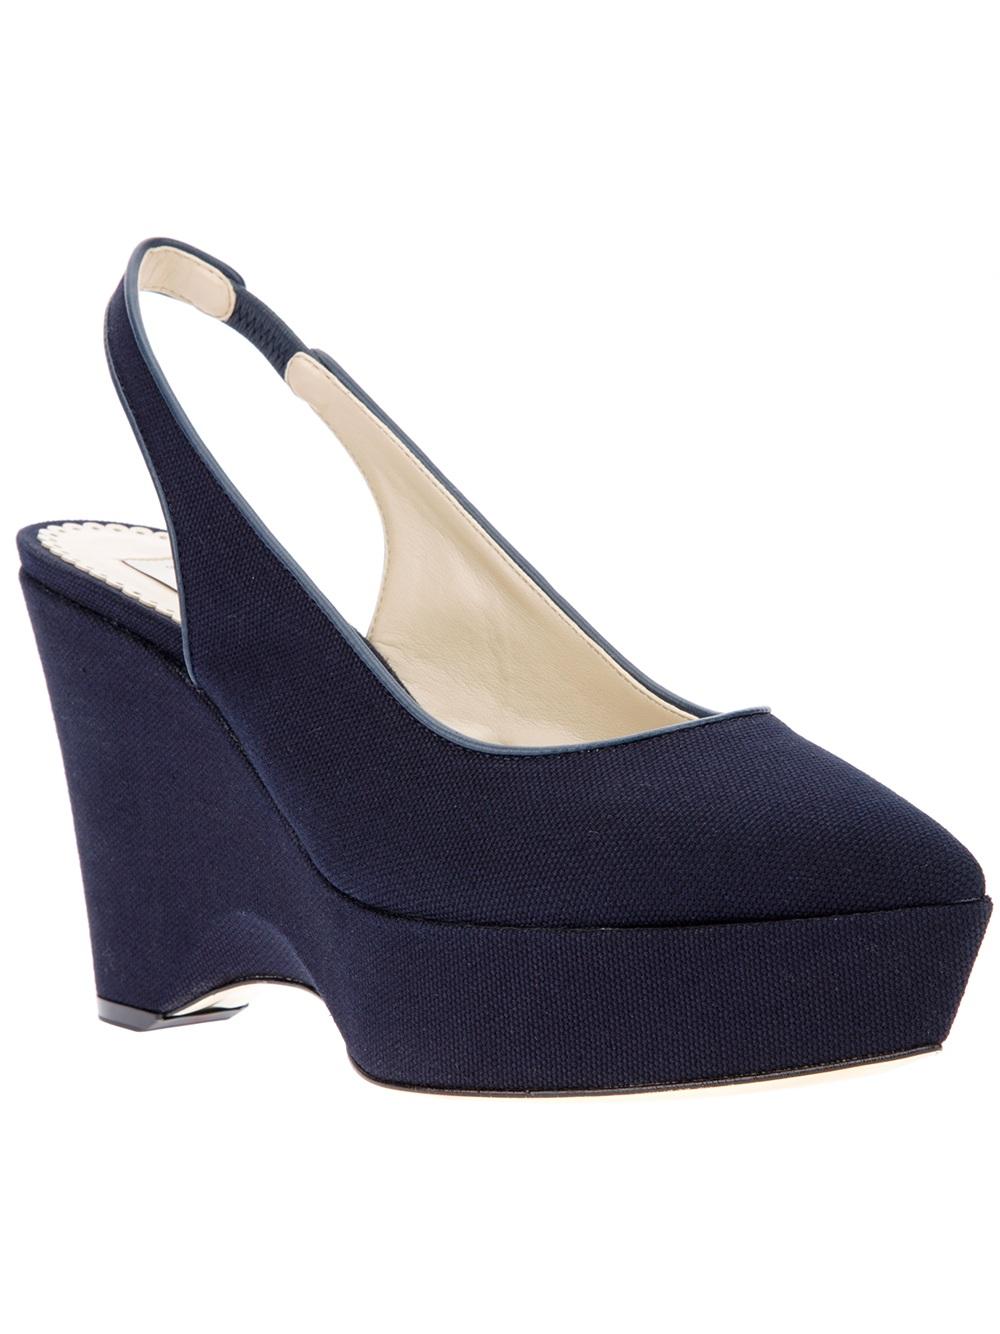 authentic sale online Stella McCartney Canvas Wedge Sandals outlet best jpedq2ns9